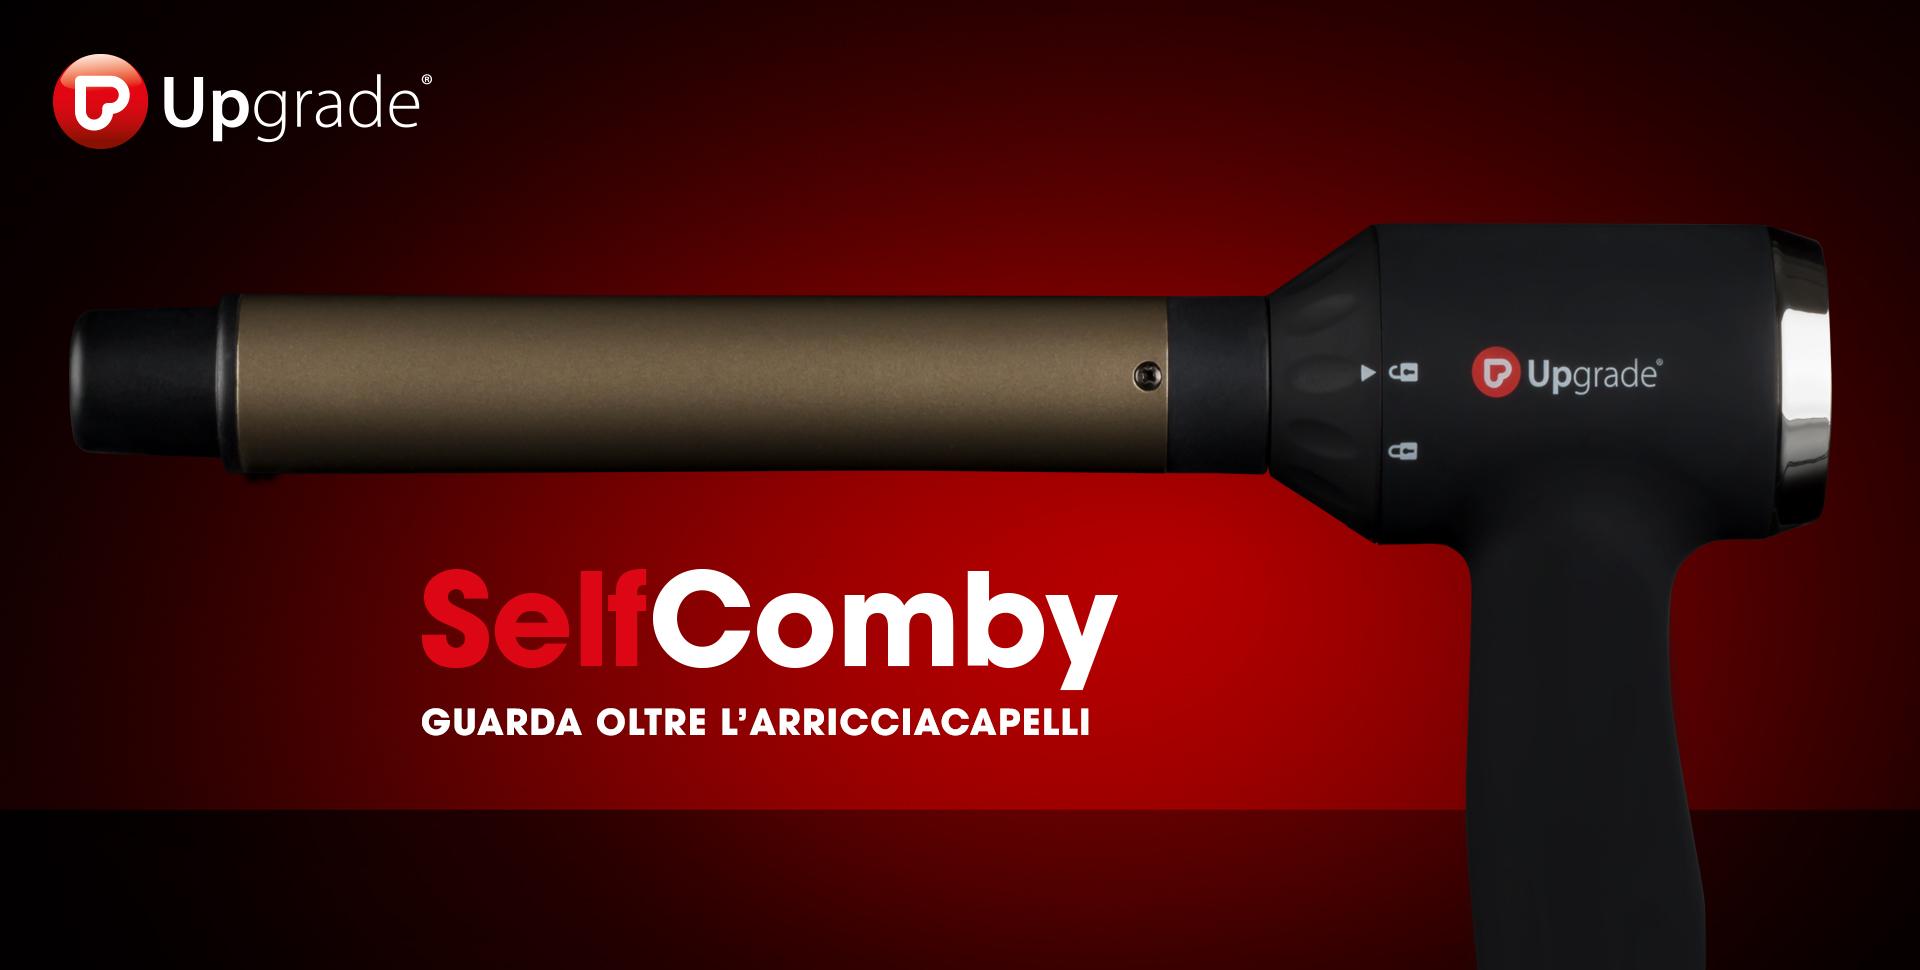 SELF COMBY, OLTRE L'ARRICCIACAPELLI